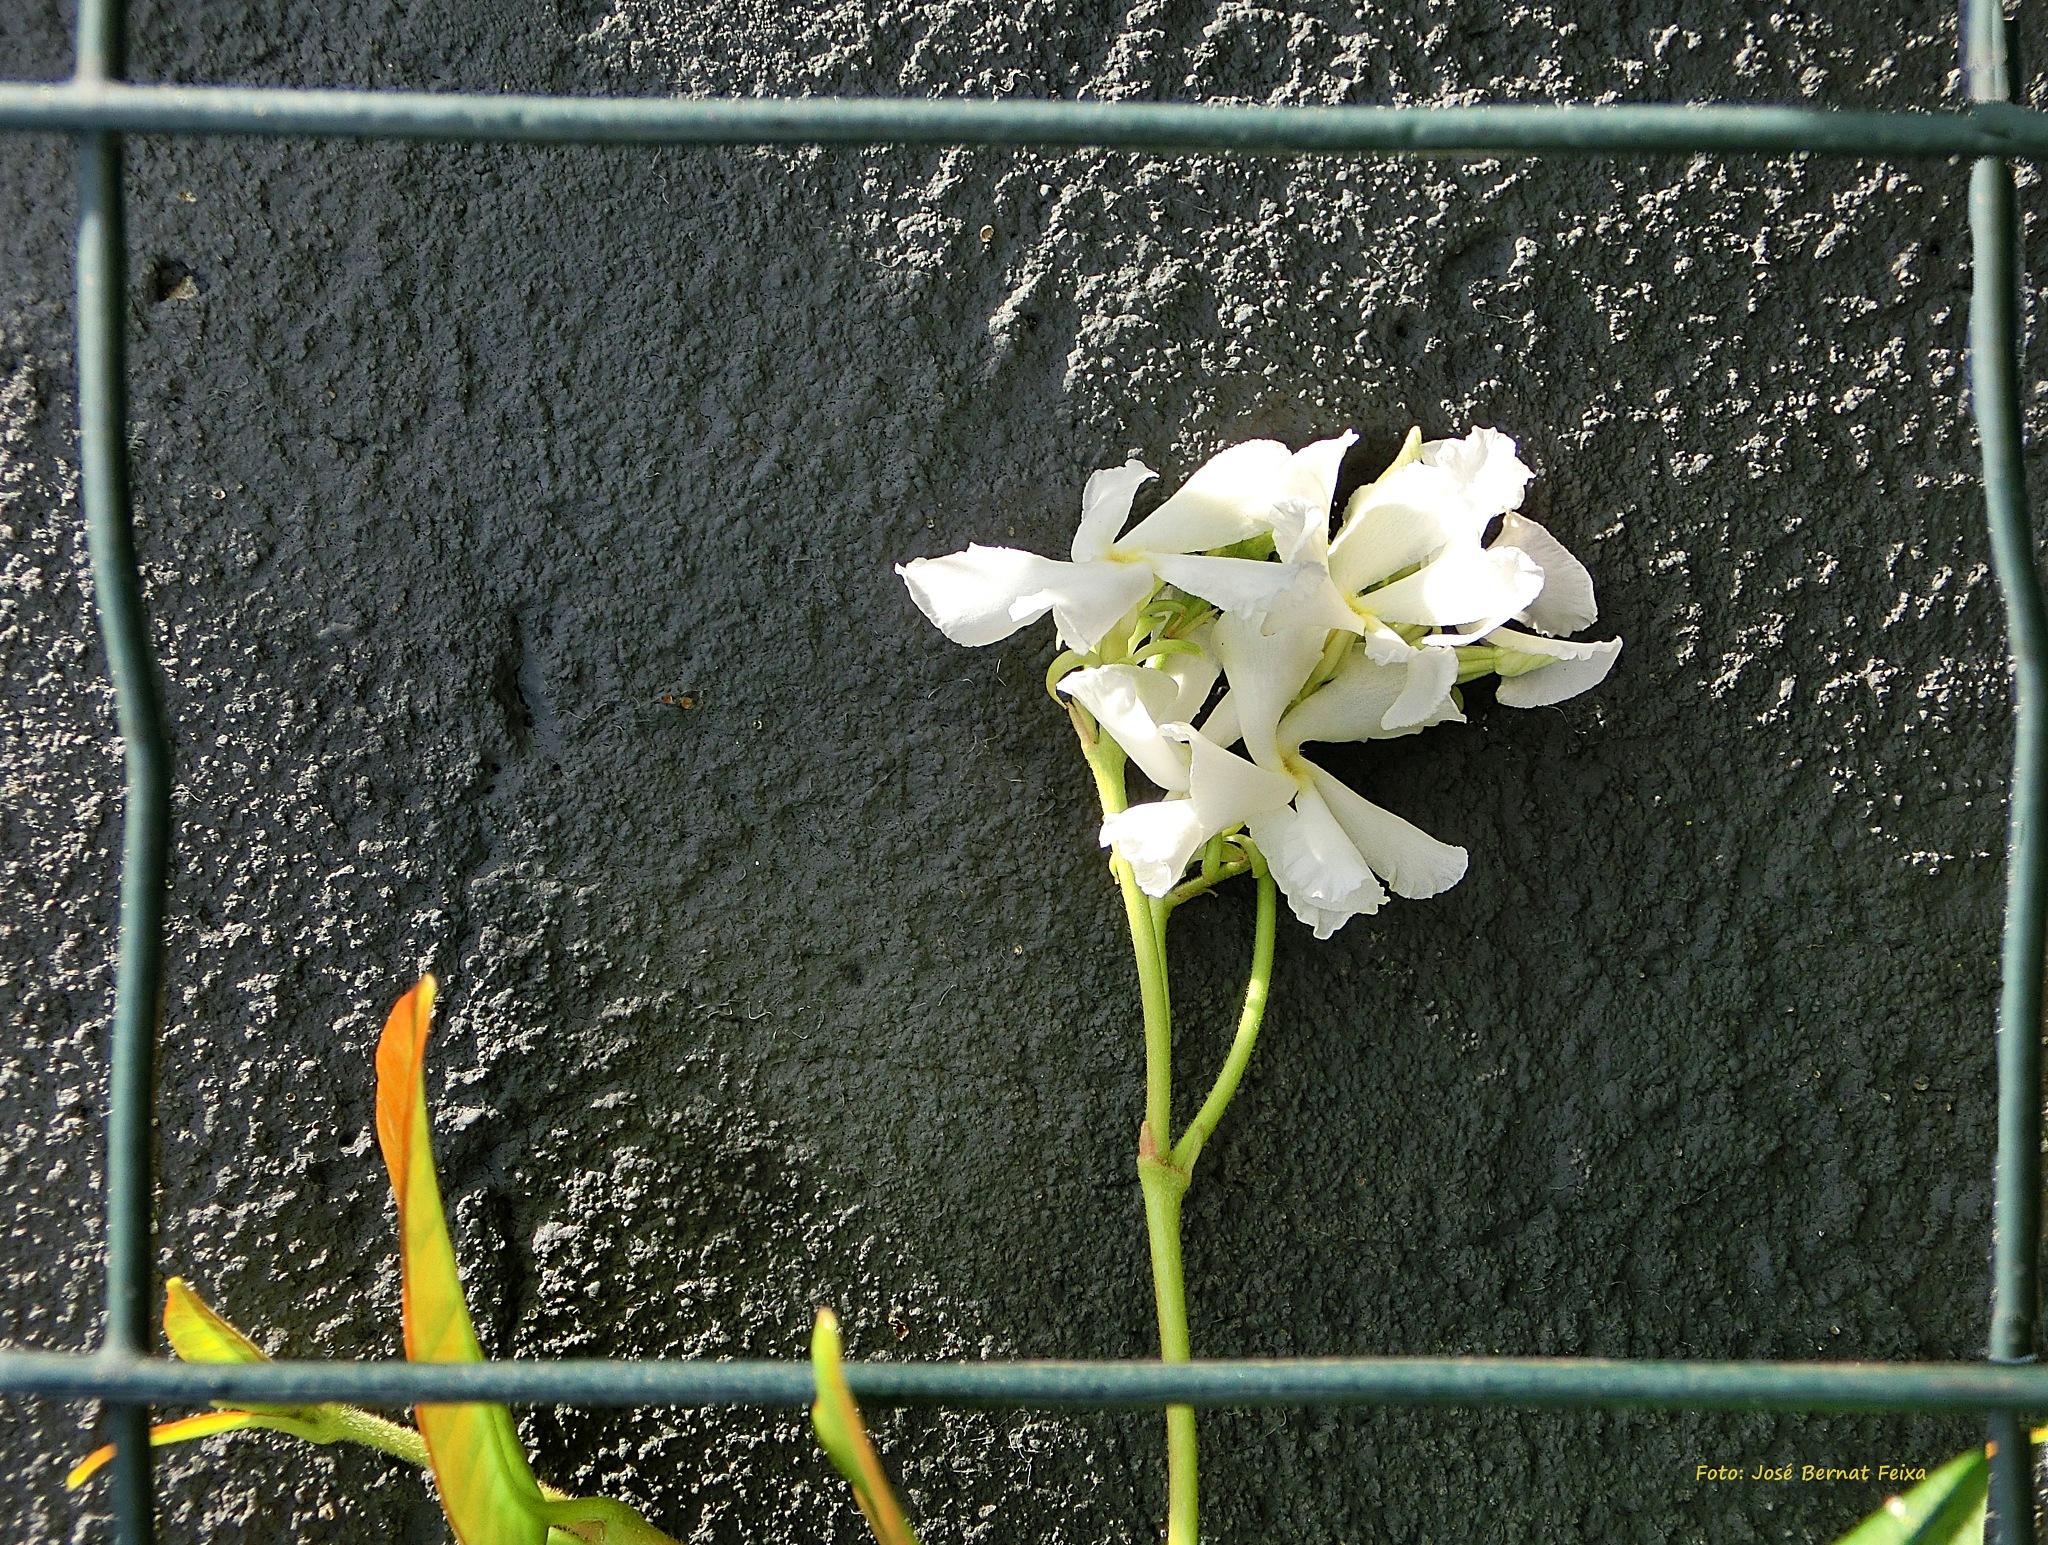 FLOR ENMARCADA ; INGELIJSTE BLOEM ; FRAMED FLOWER by José Bernat Feixa